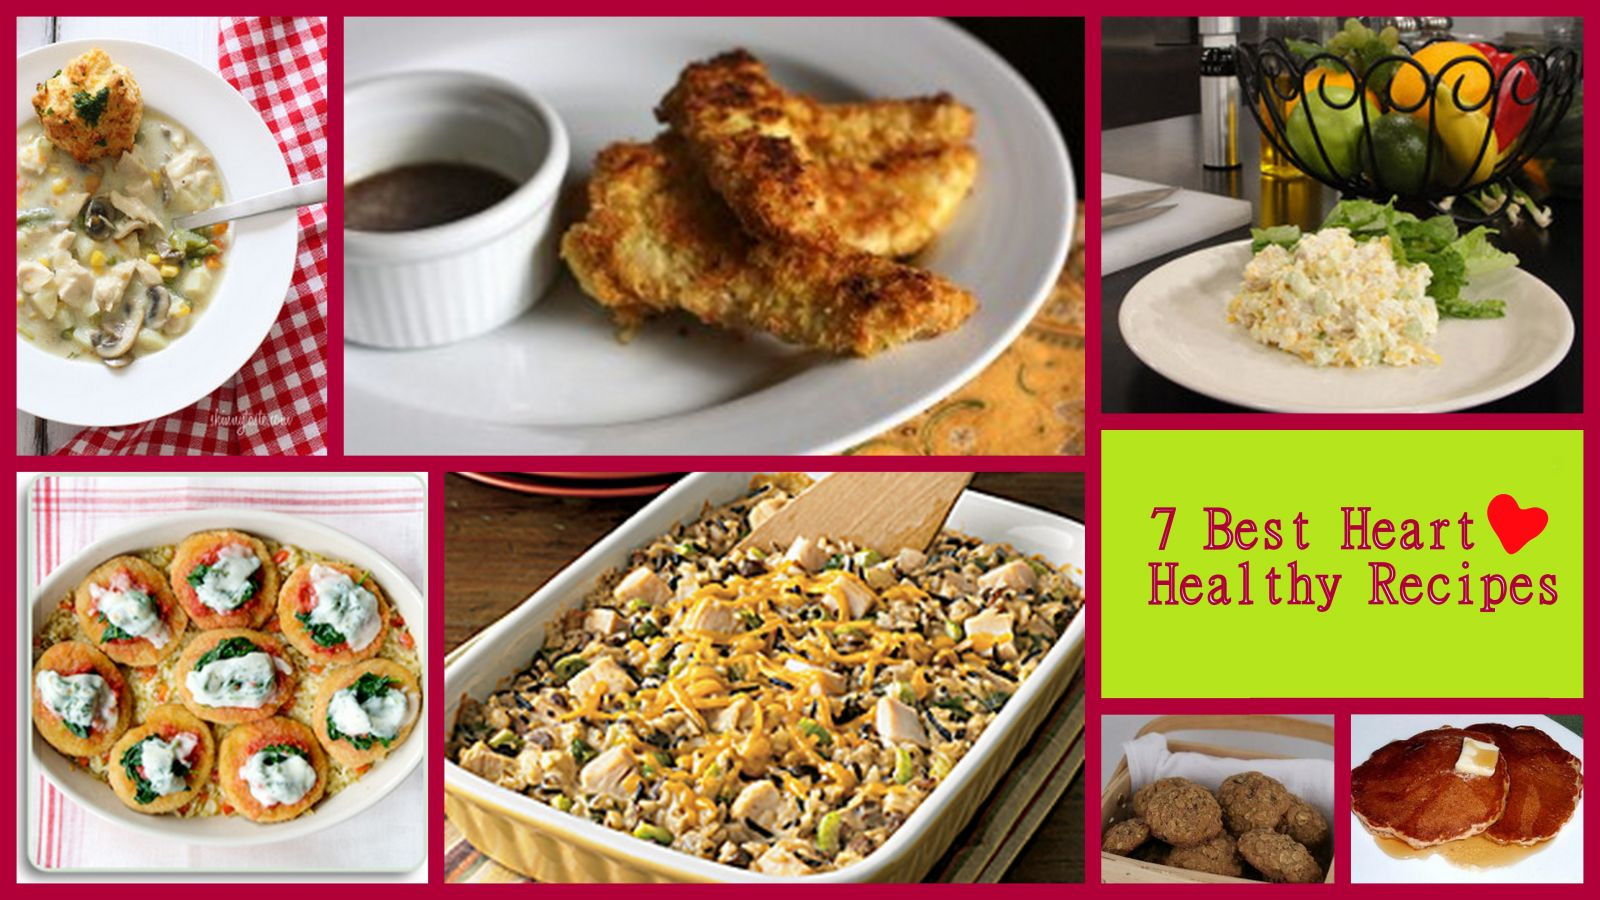 Best Heart Healthy Recipes  7 Best Heart Healthy Recipes